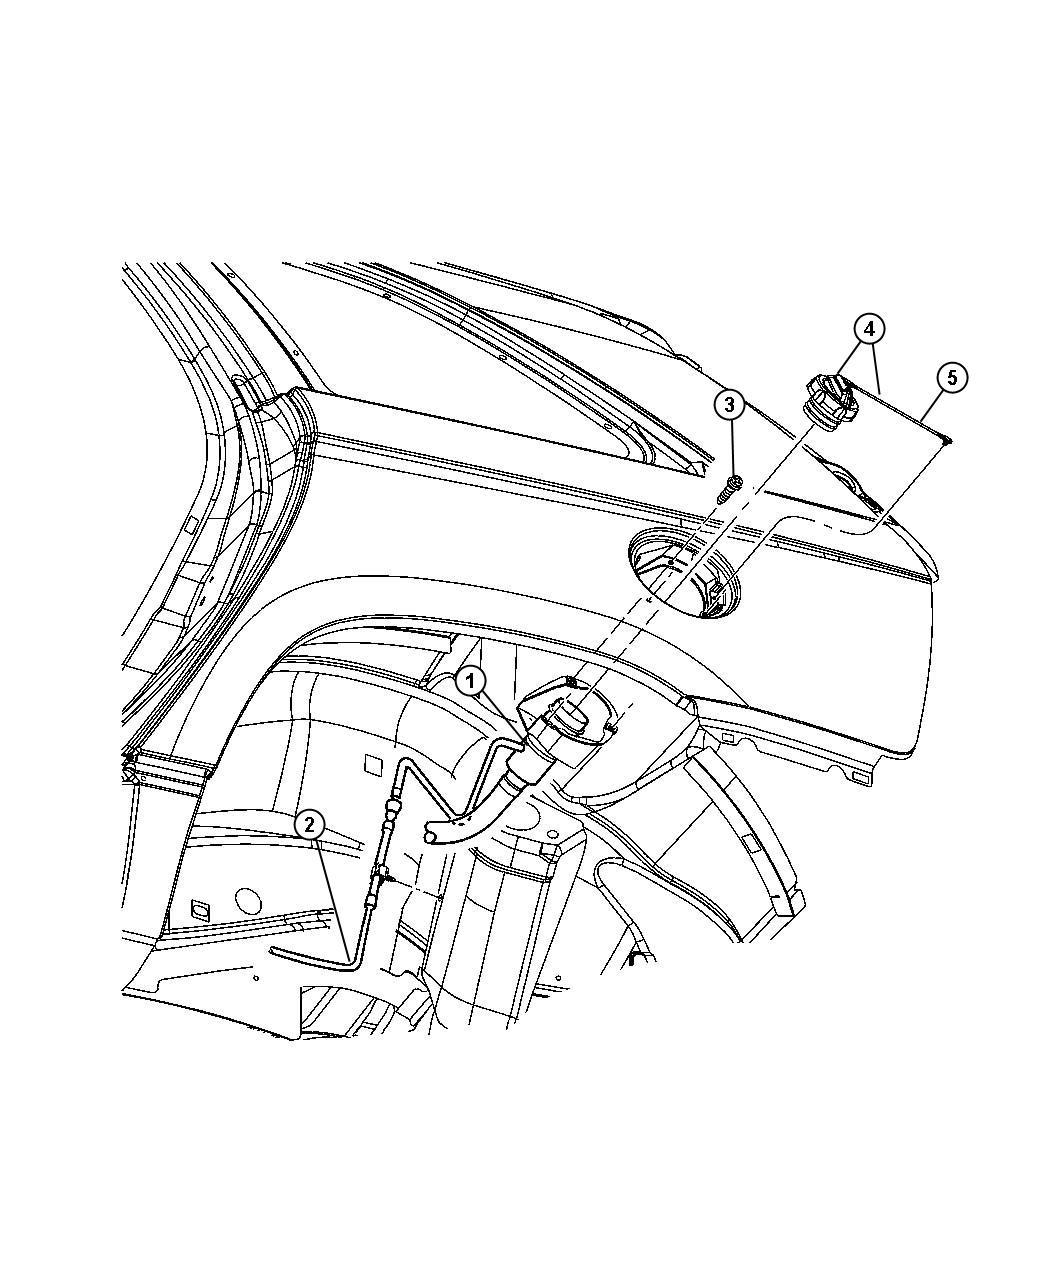 Chrysler Pacifica Tether Fuel Filler Cap